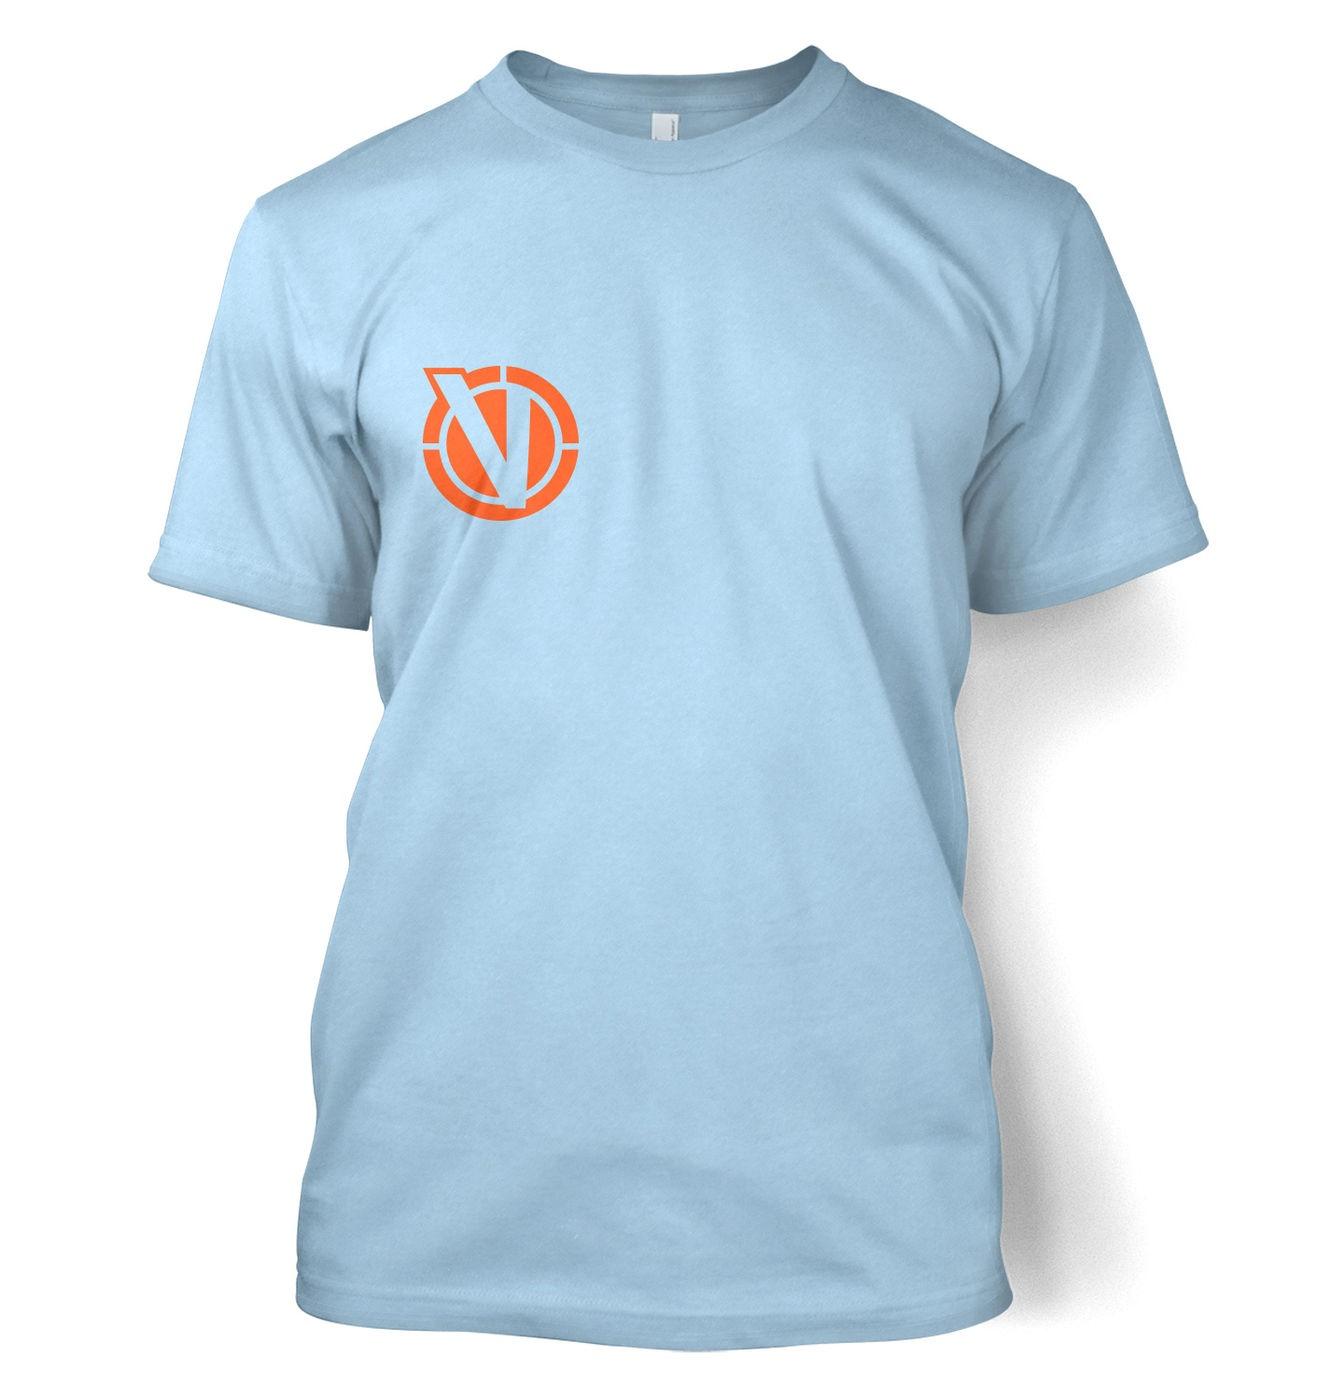 Vindicators Logo t-shirt by Something Geeky